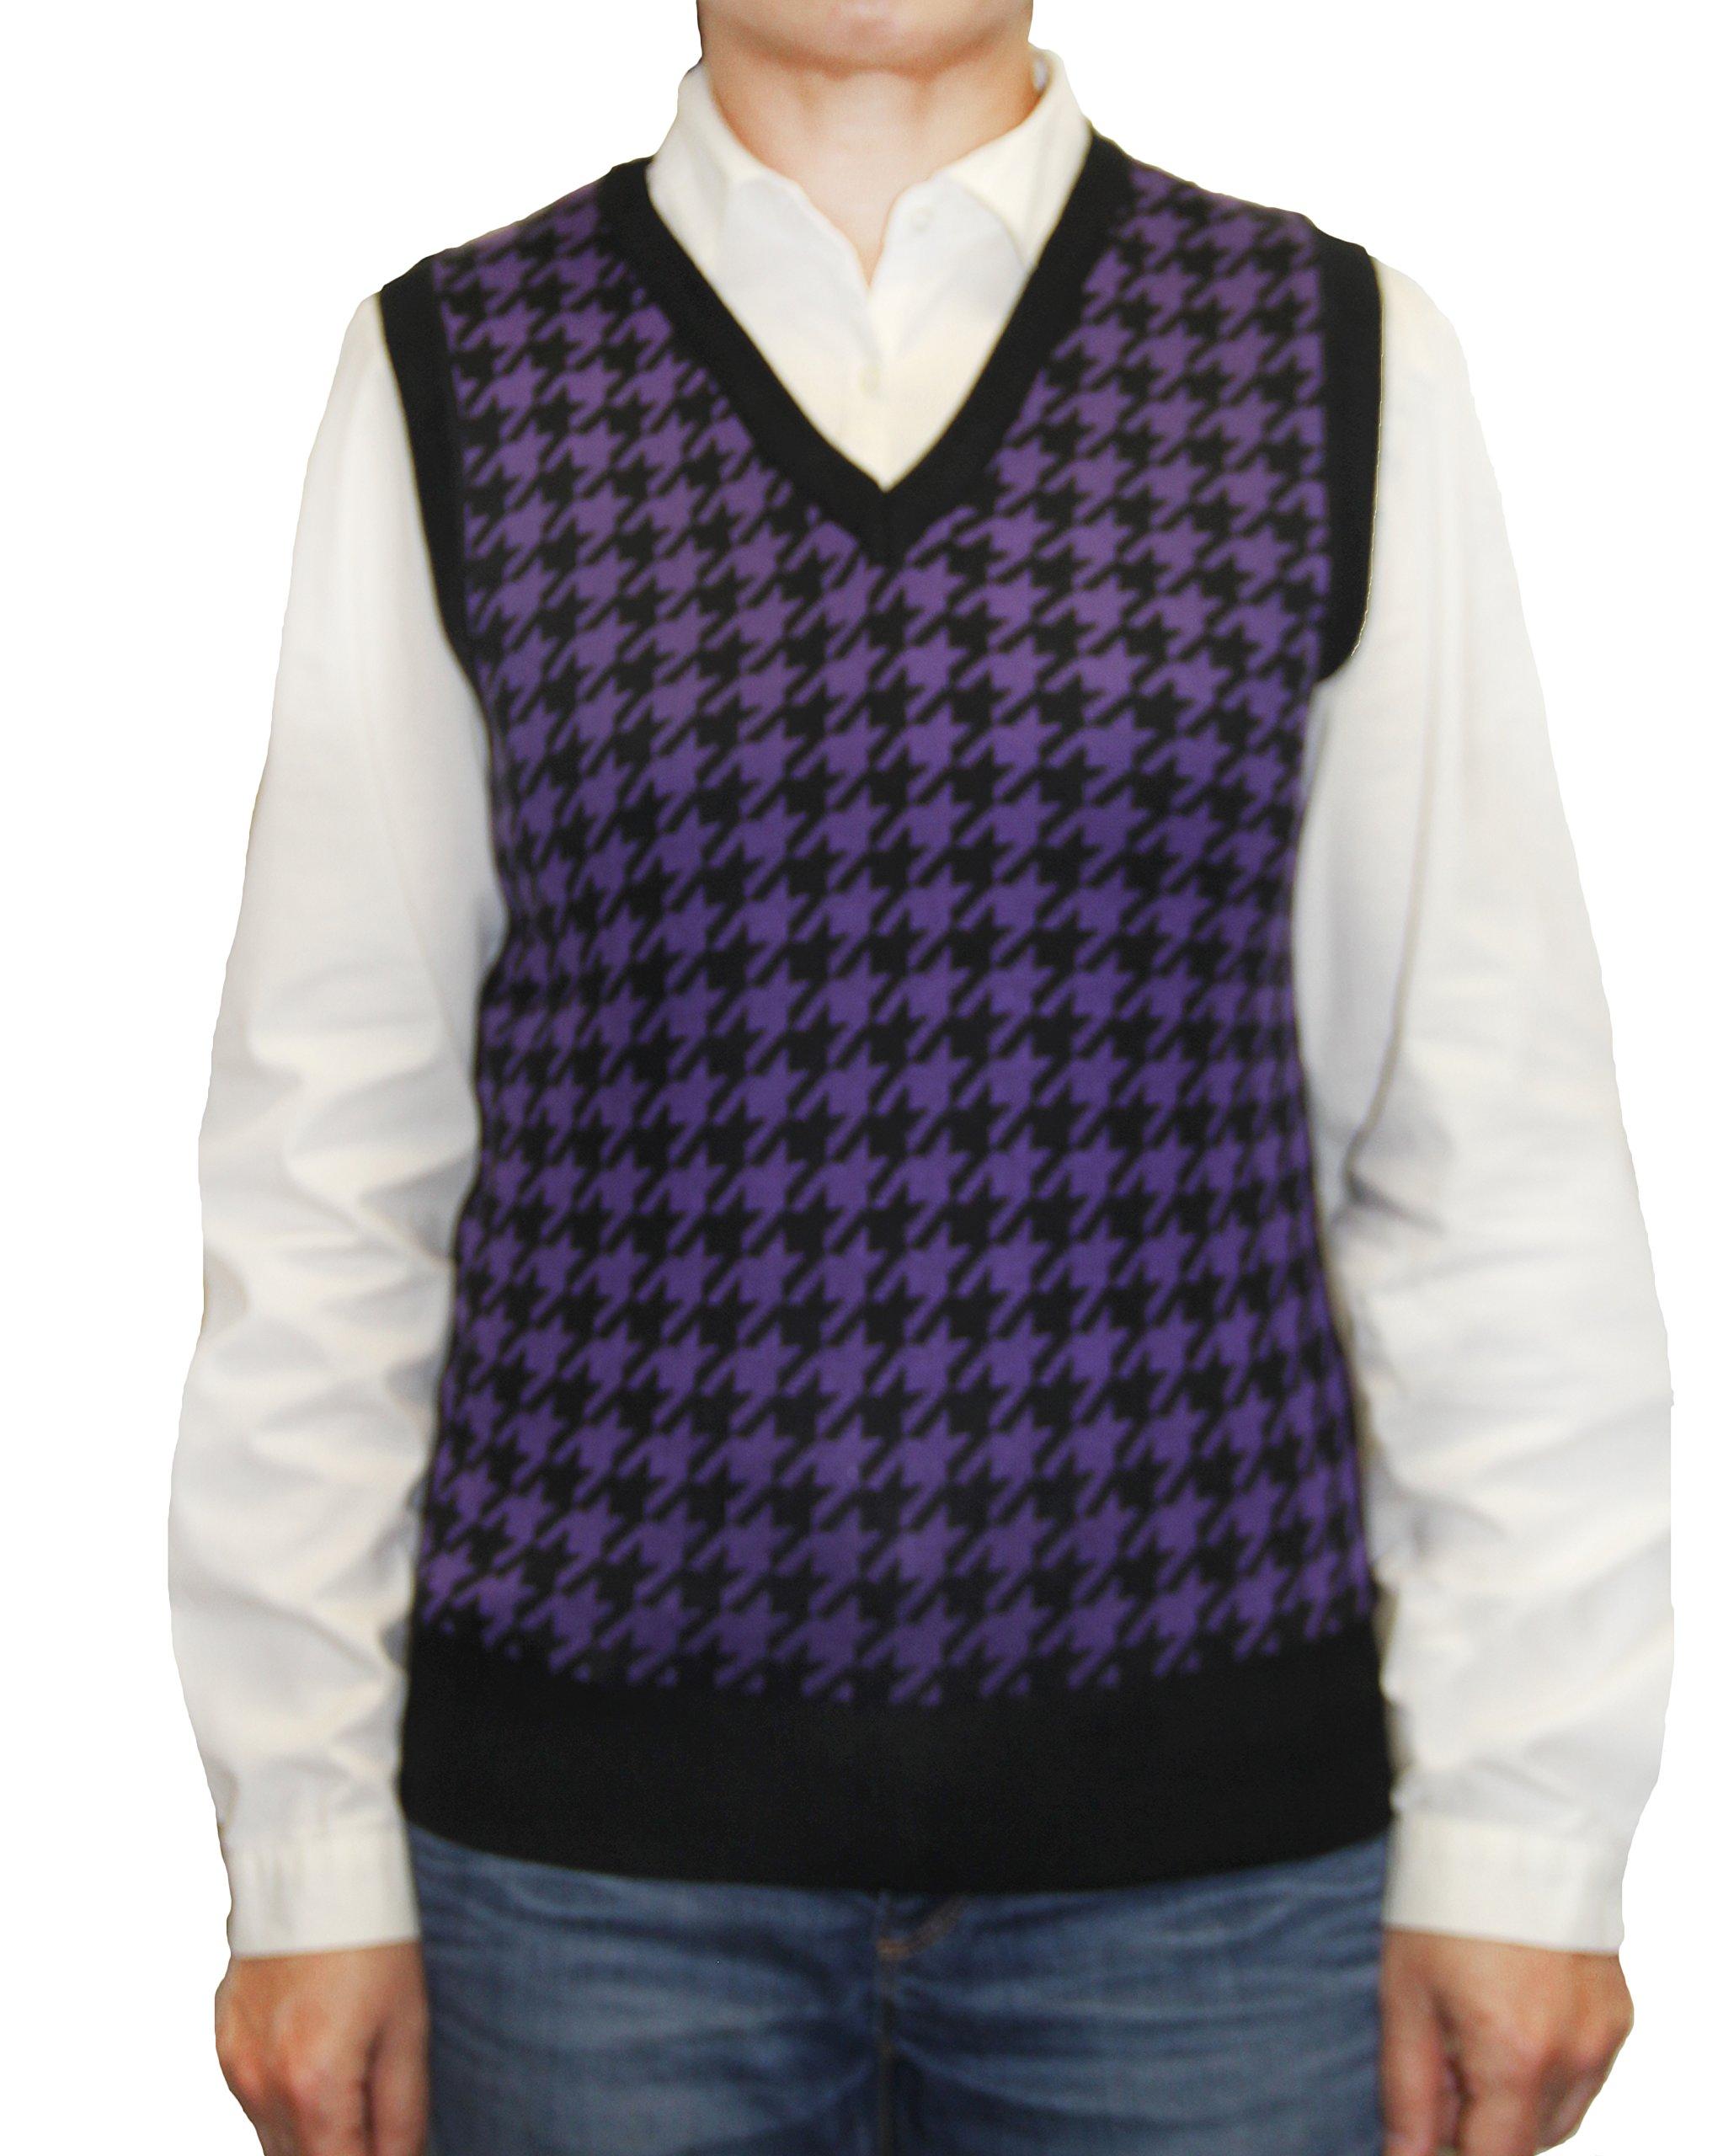 Blue Ocean Ladies Houndstooth Sweater Vest-Small